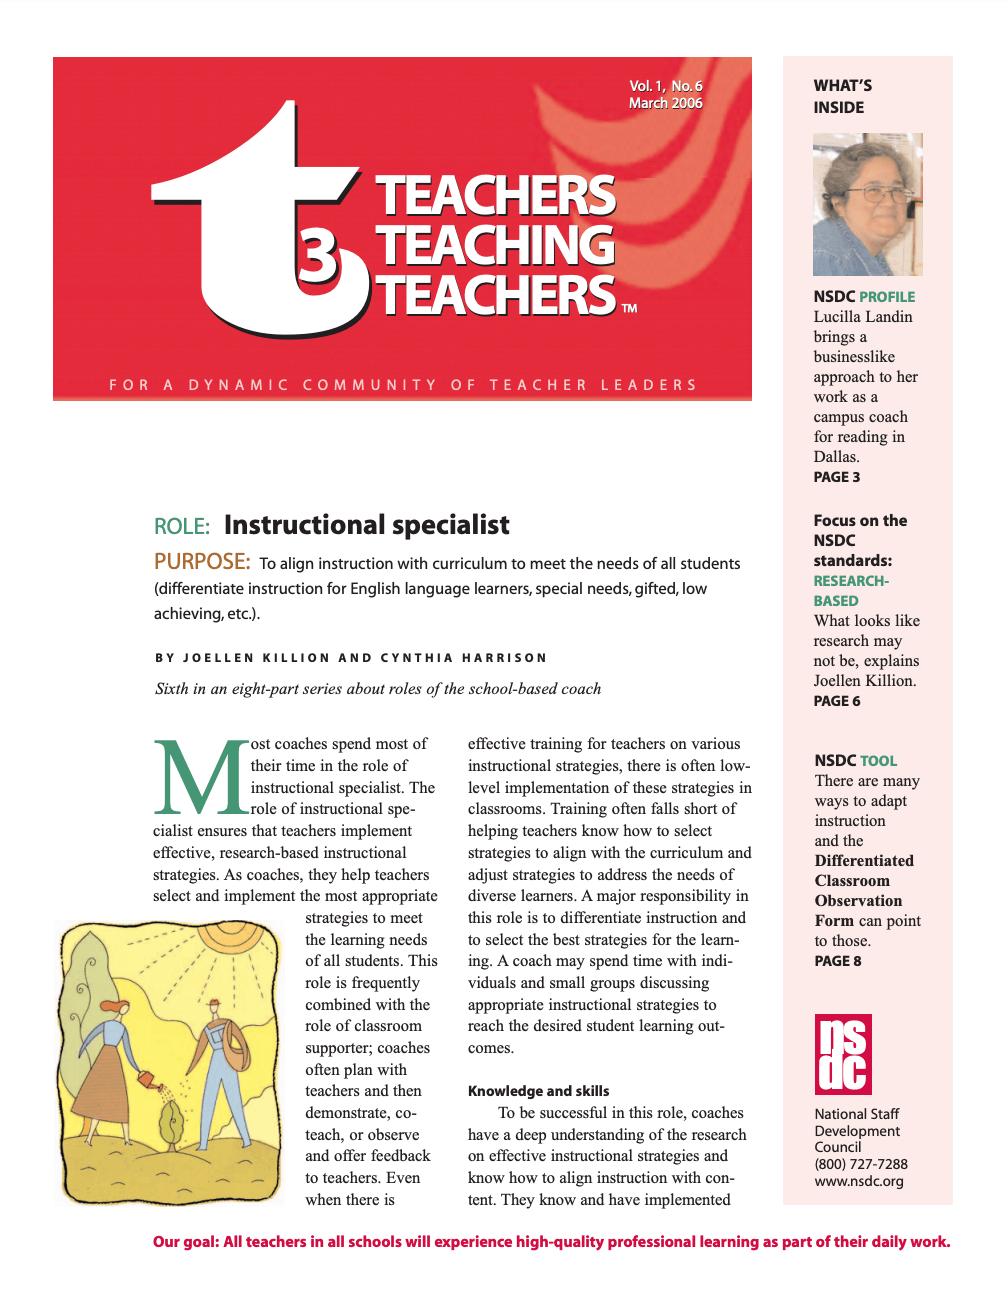 teachers-teaching-teachers-march-2006-vol-1-no-6